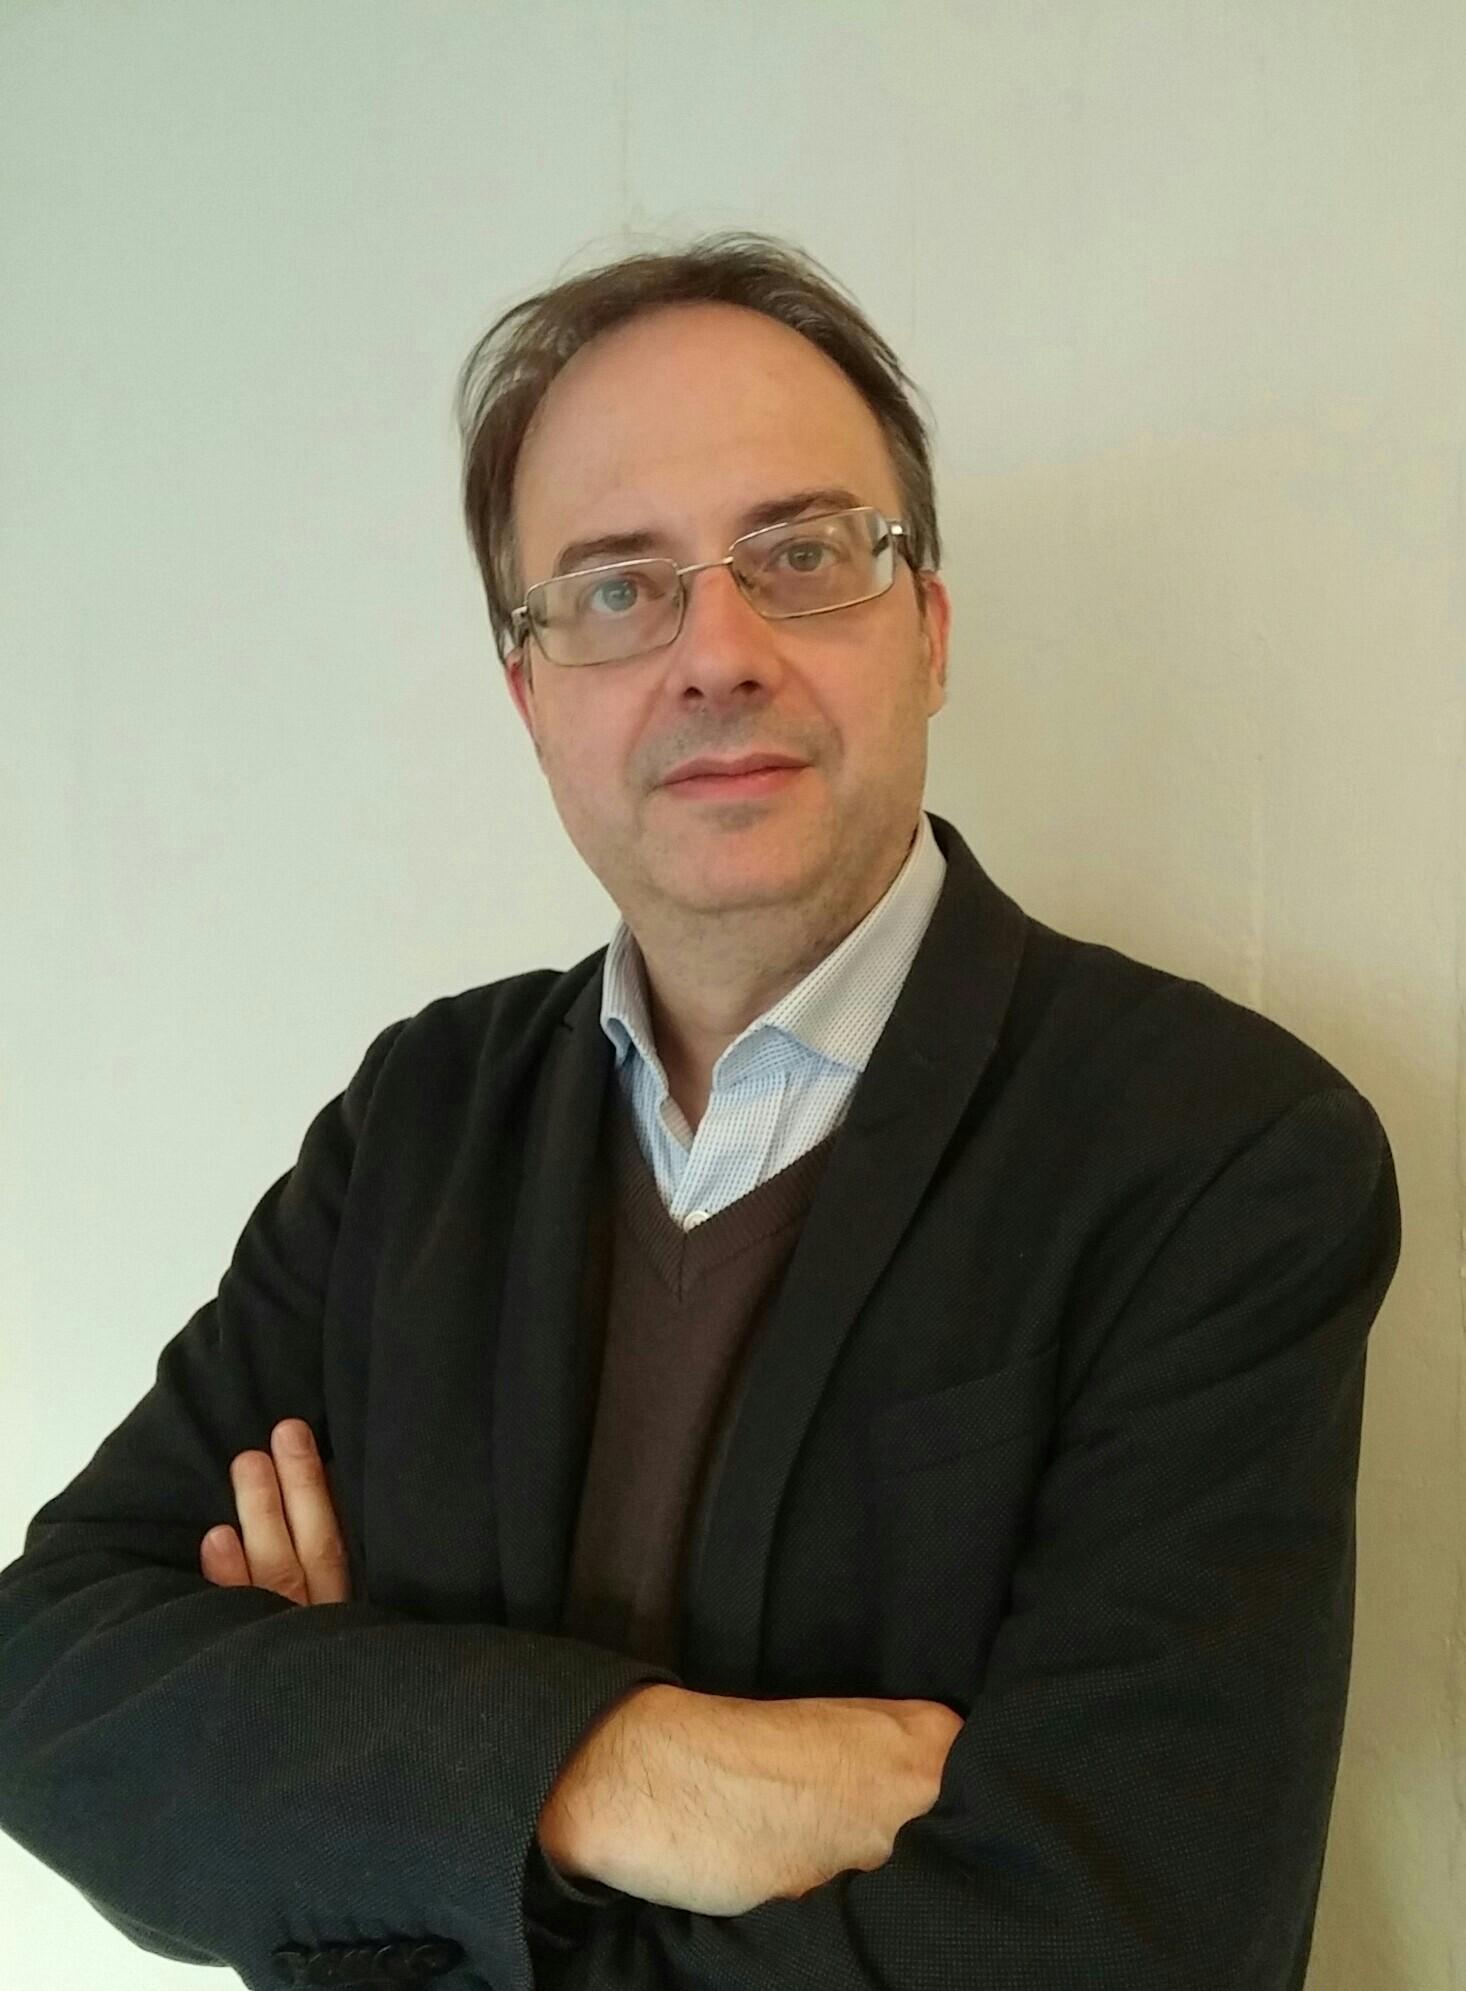 Olivier Agard